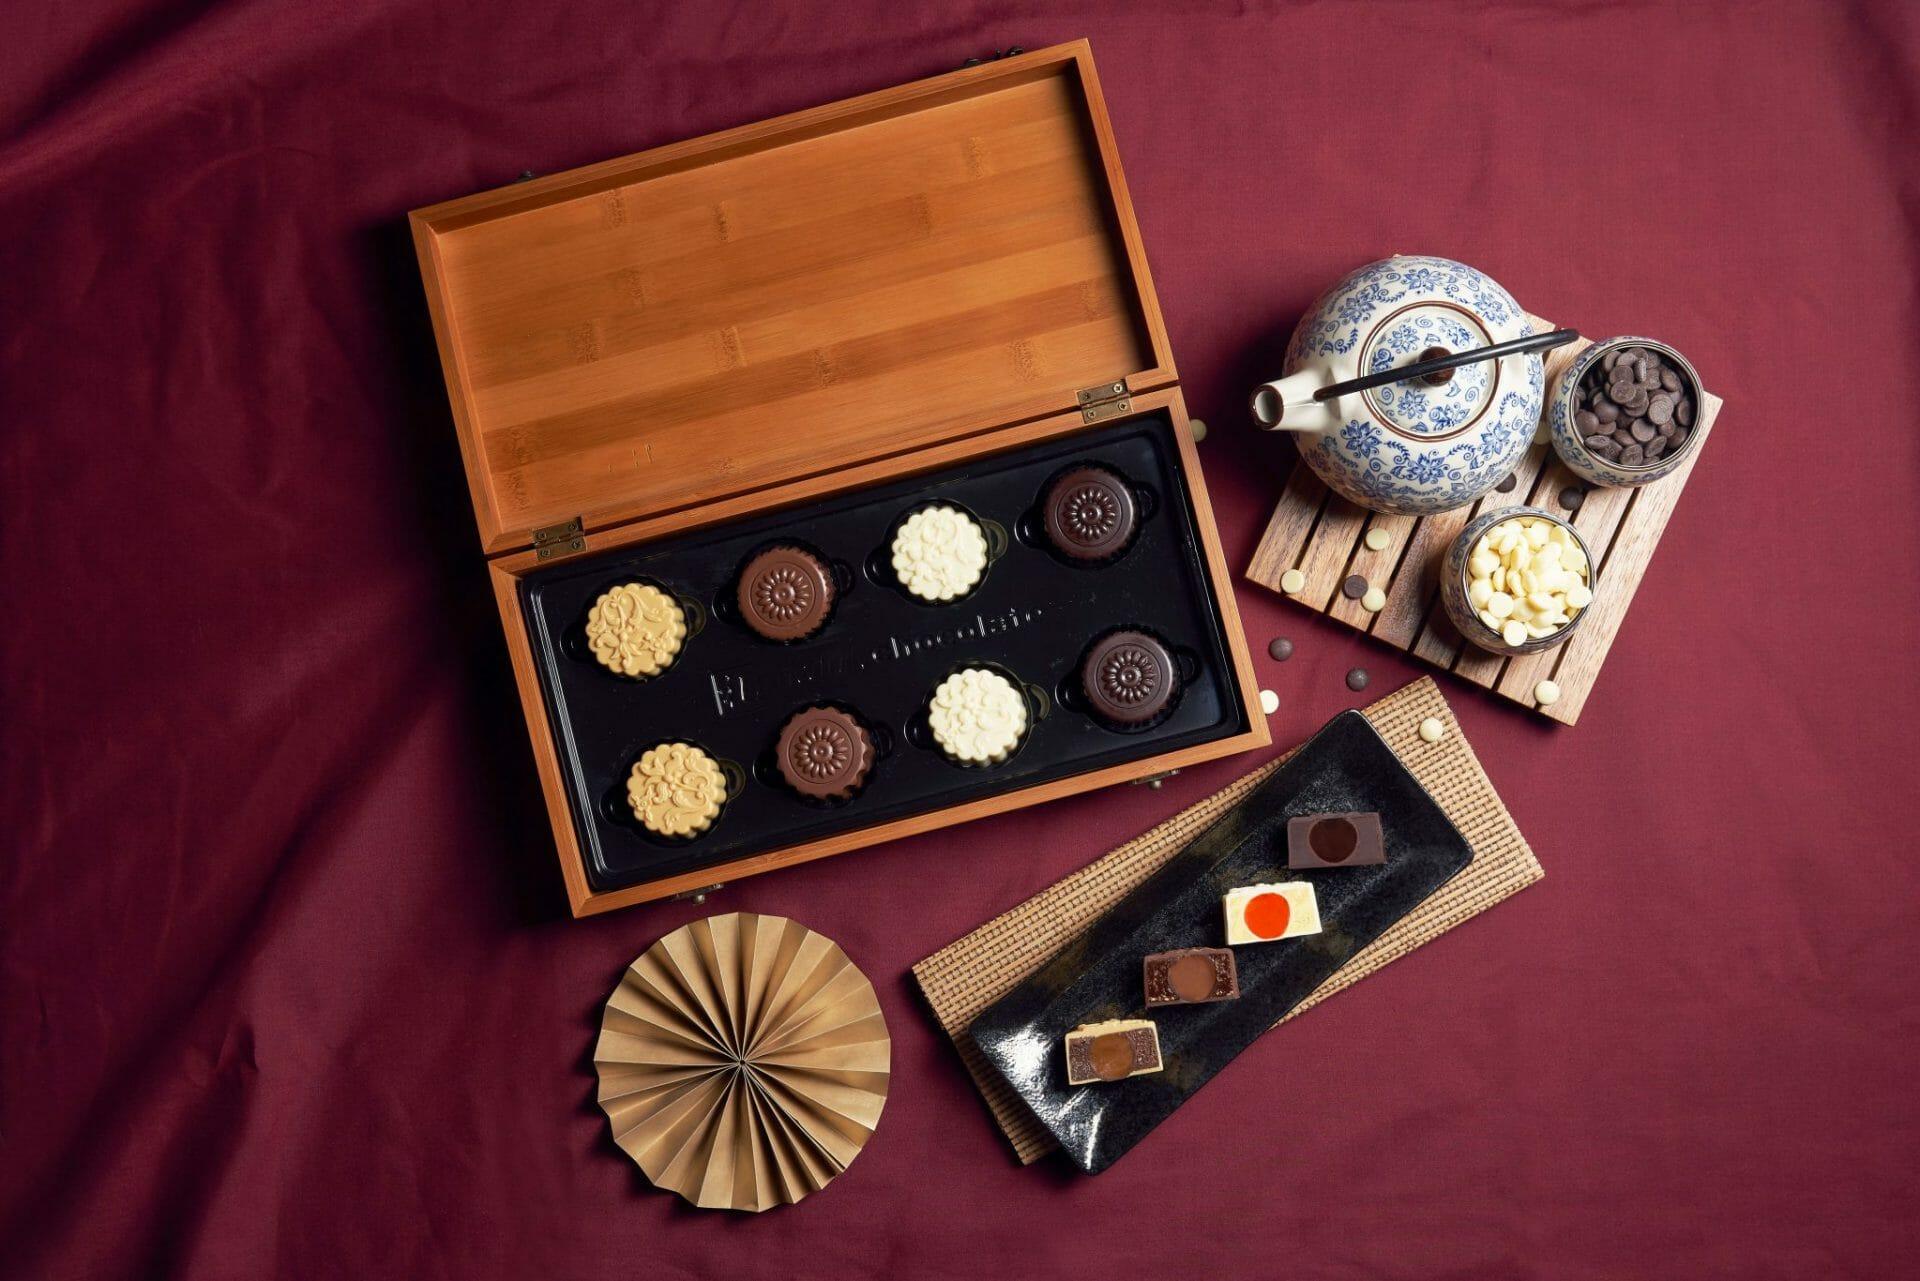 Awfully Chocolate Signature Chocolate Truffle Mooncake with Bamboo Box